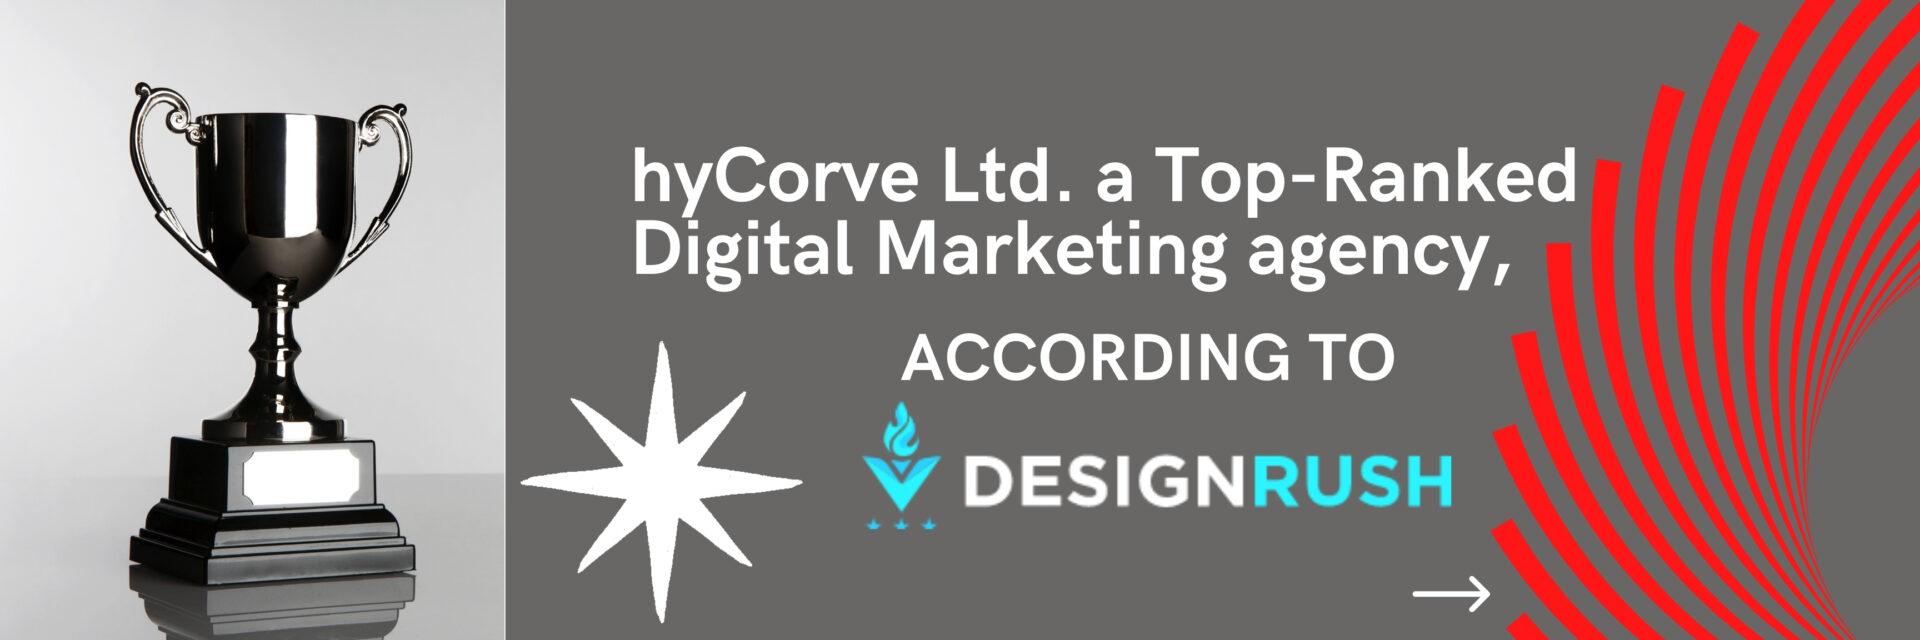 hyCorve Ltd. ranked as Top-Ranked Digital Marketing agency,